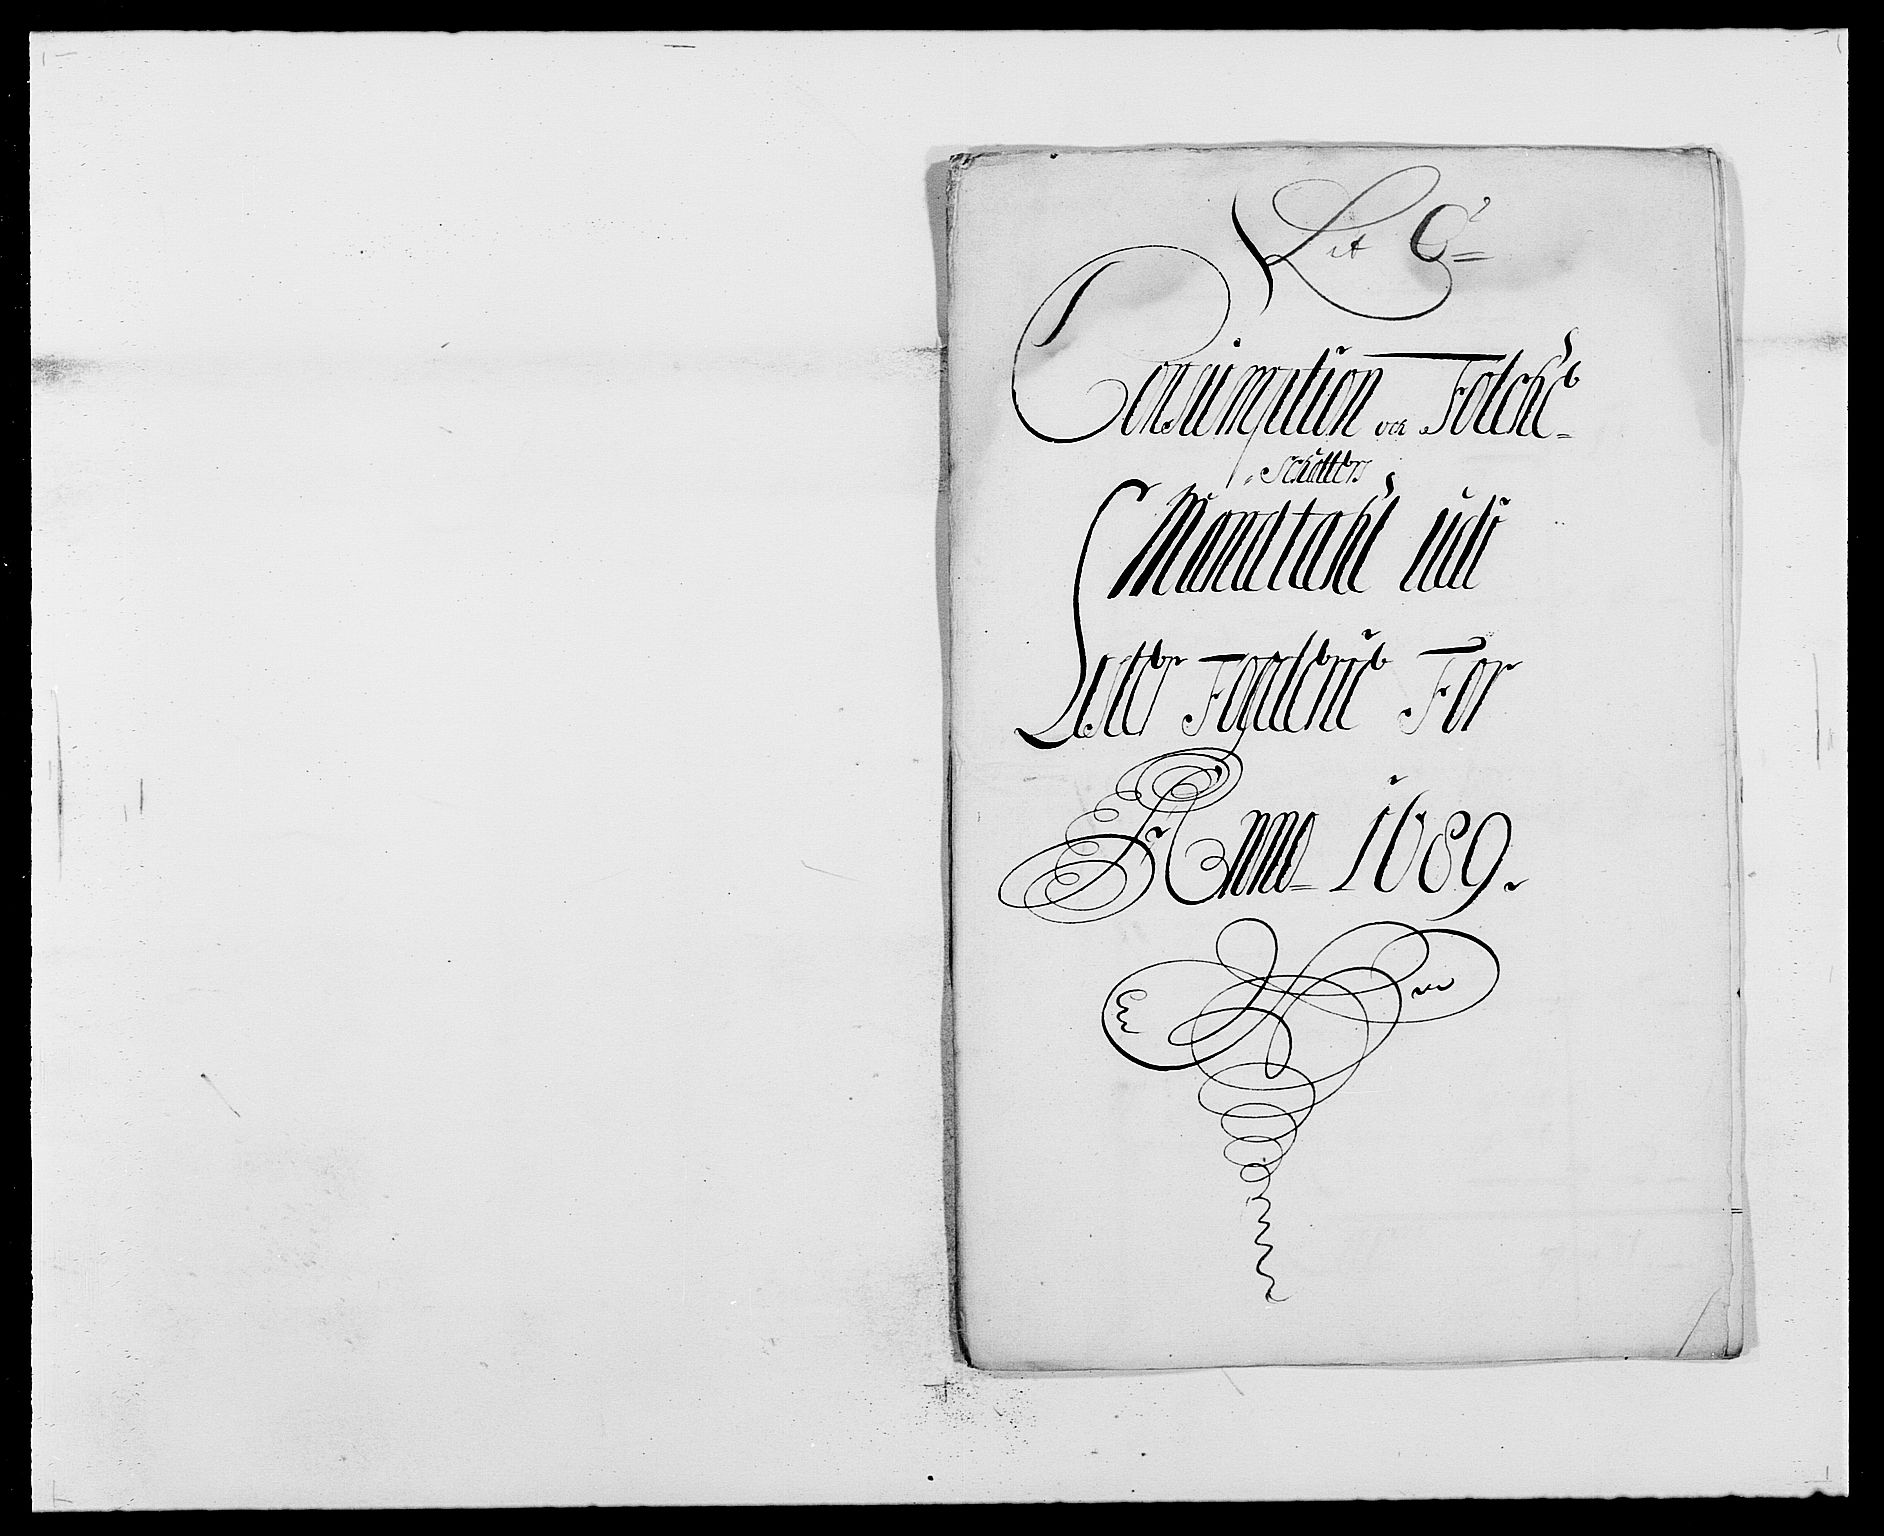 RA, Rentekammeret inntil 1814, Reviderte regnskaper, Fogderegnskap, R41/L2535: Fogderegnskap Lista, 1686-1689, s. 16